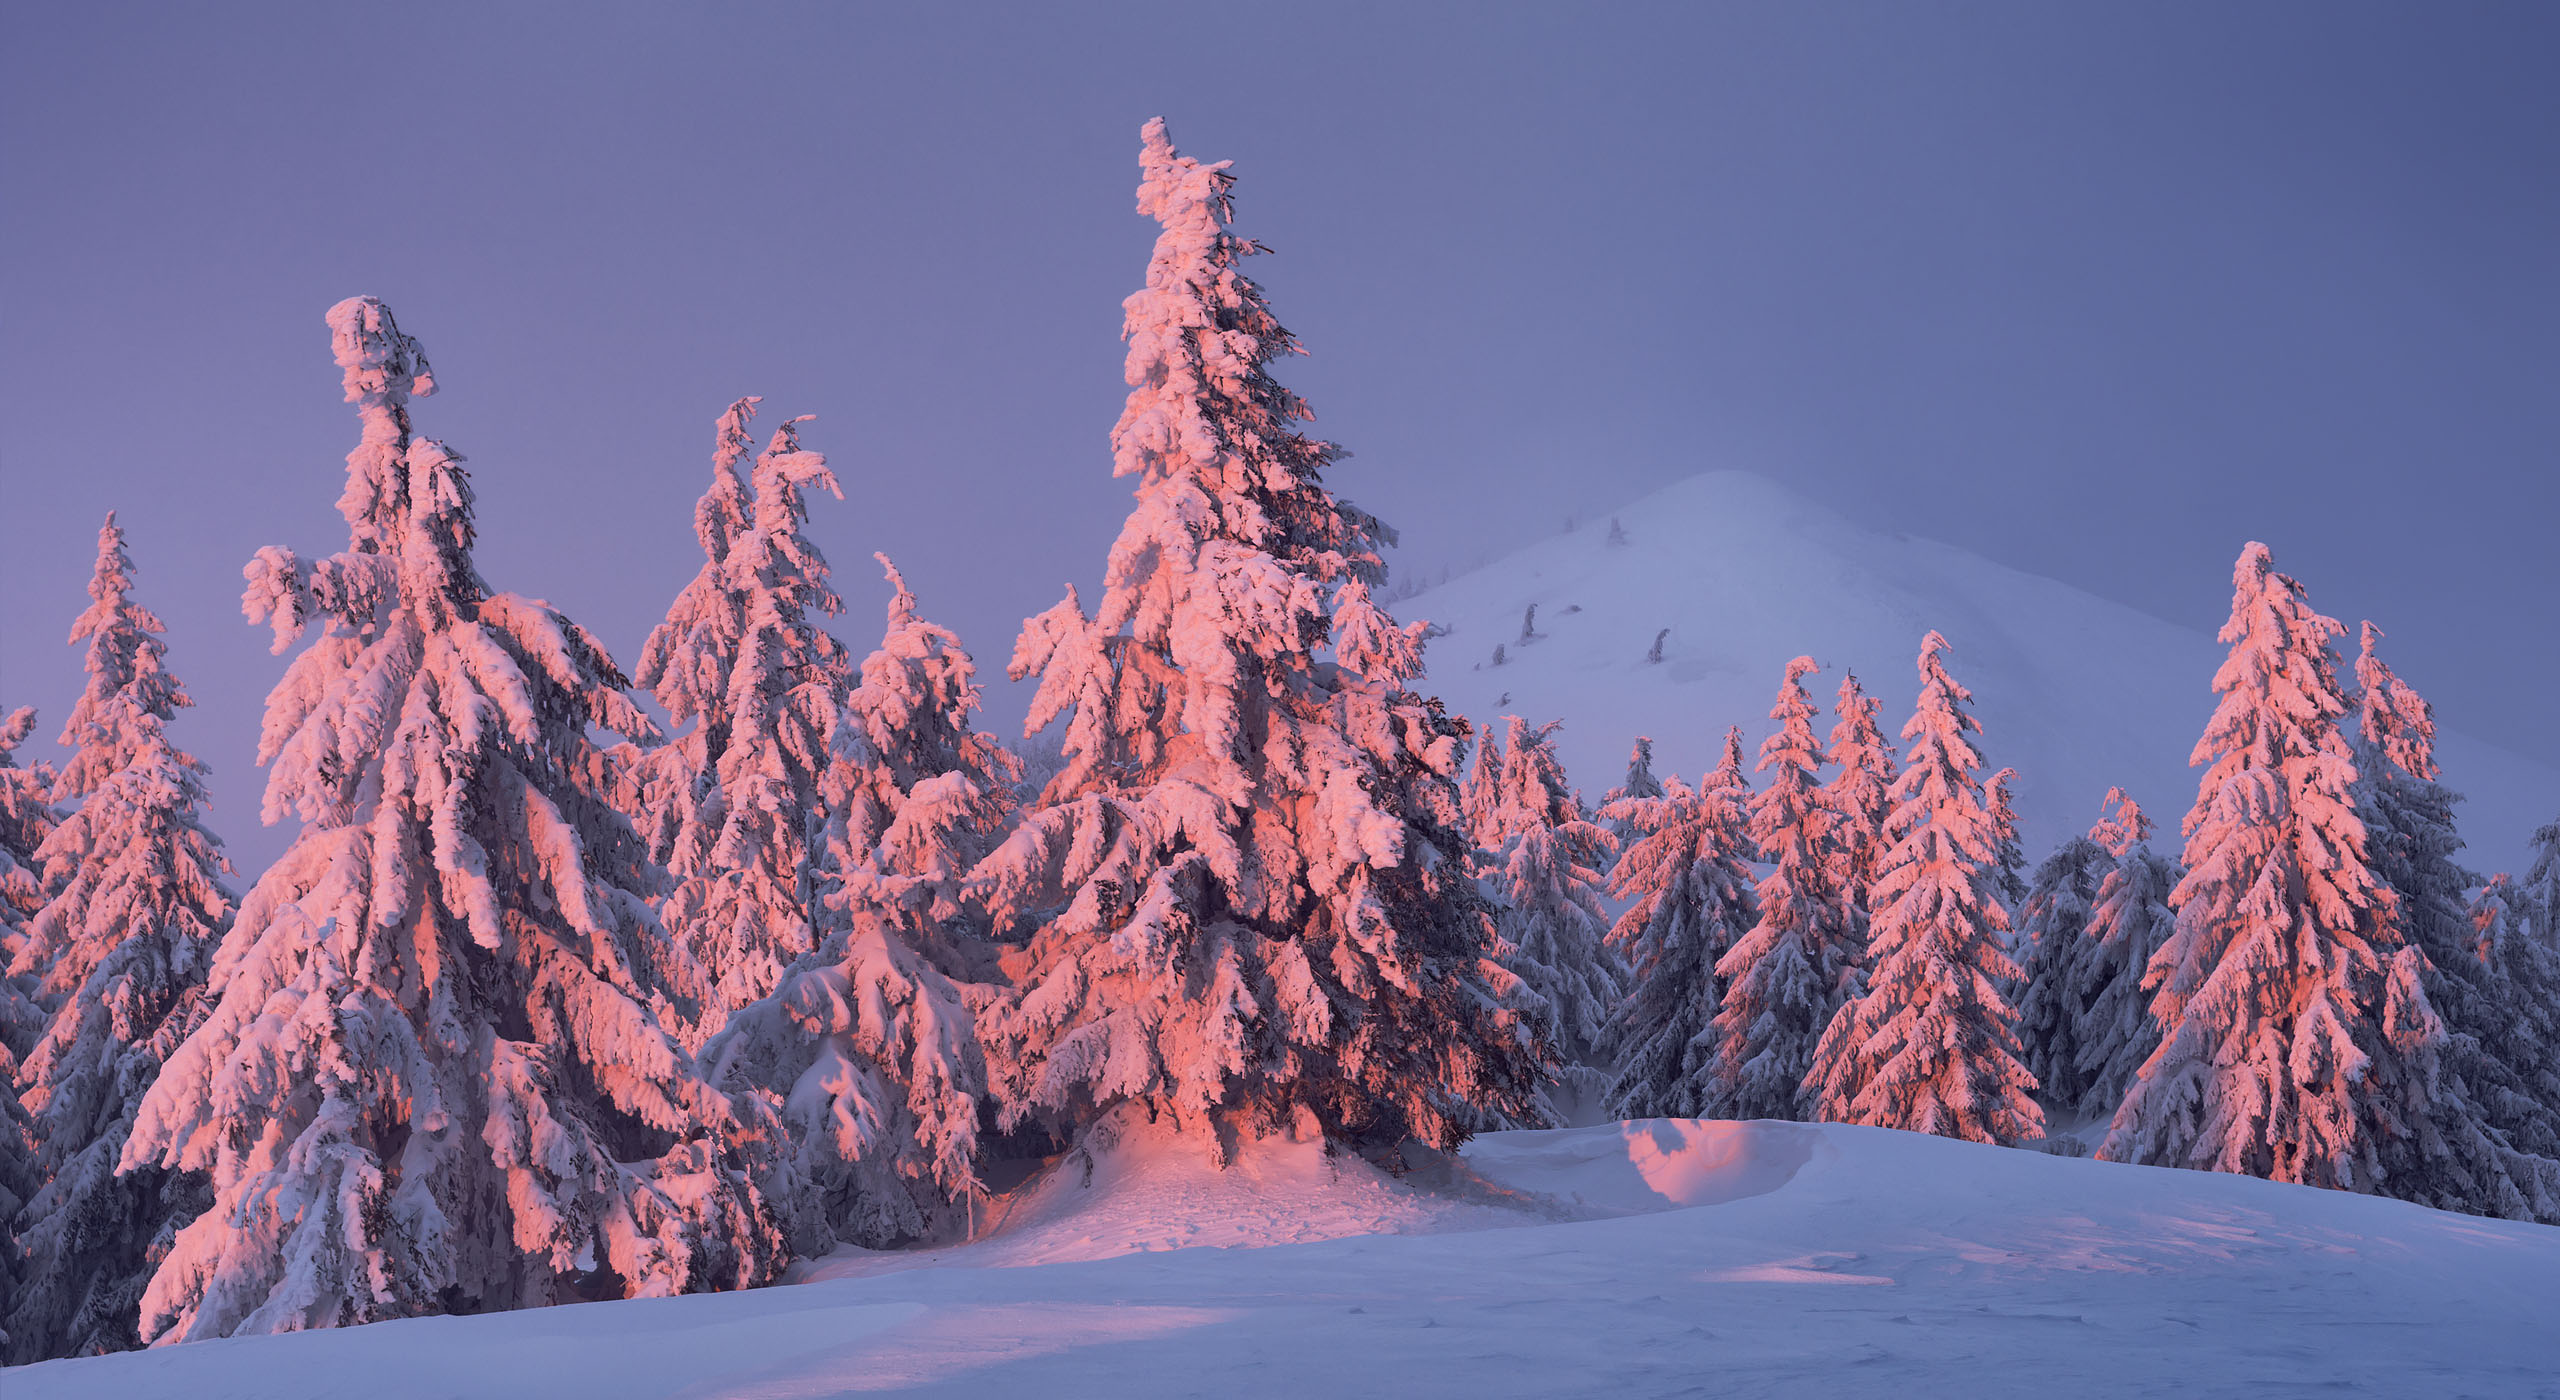 Winter evening in Carpathians